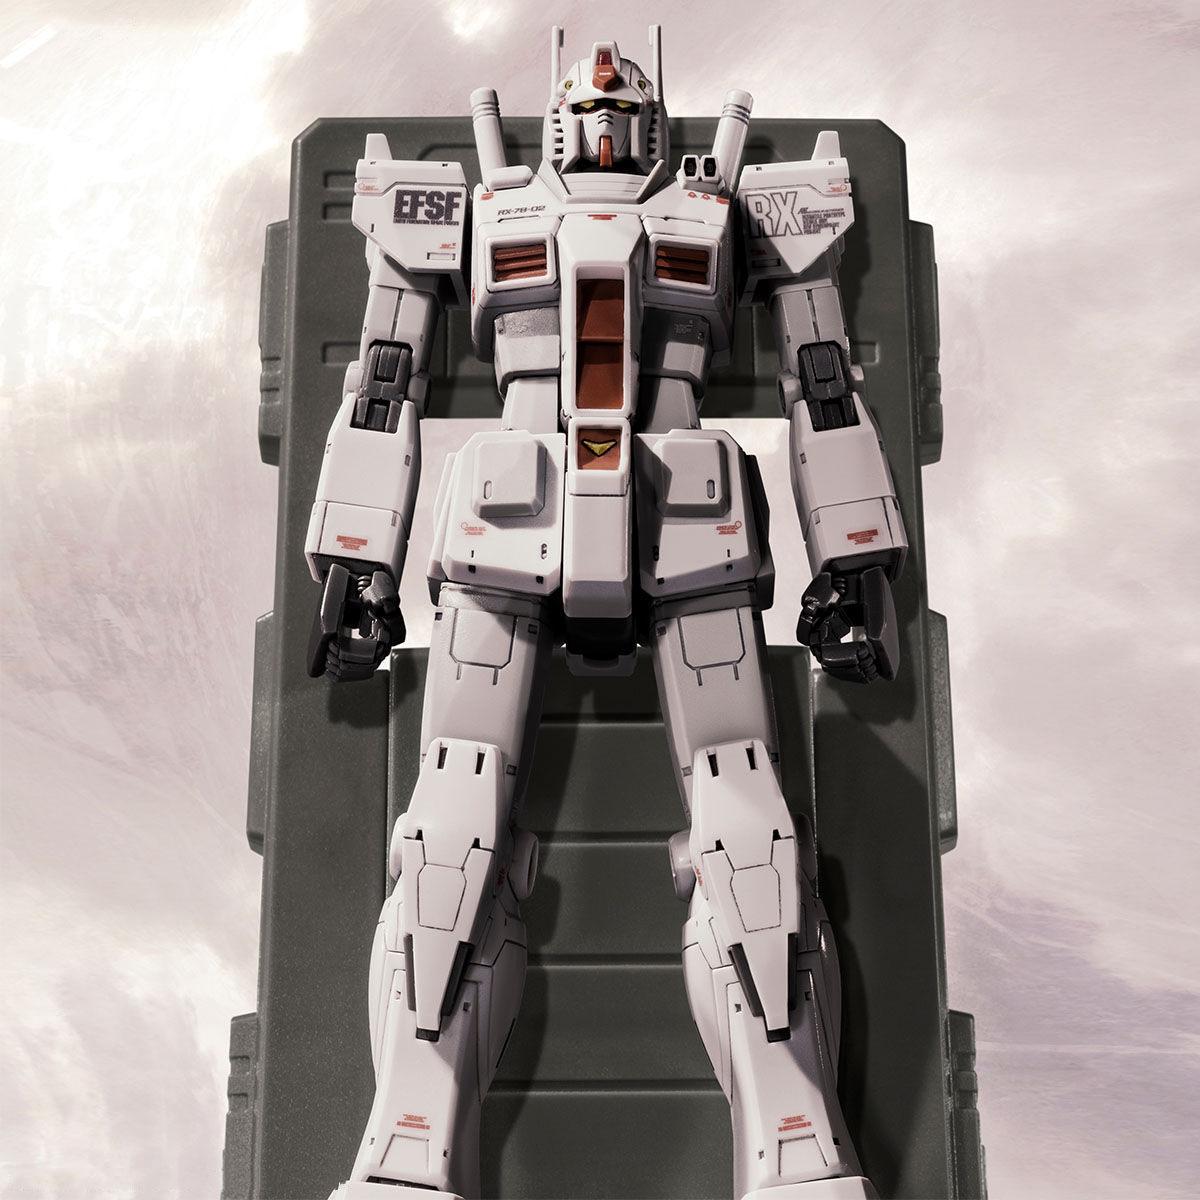 HG 1/144 RX-78-02 GUNDAM ROLLOUT COLOR (GUNDAM THE ORIGIN Ver.) [2021年7月發送]